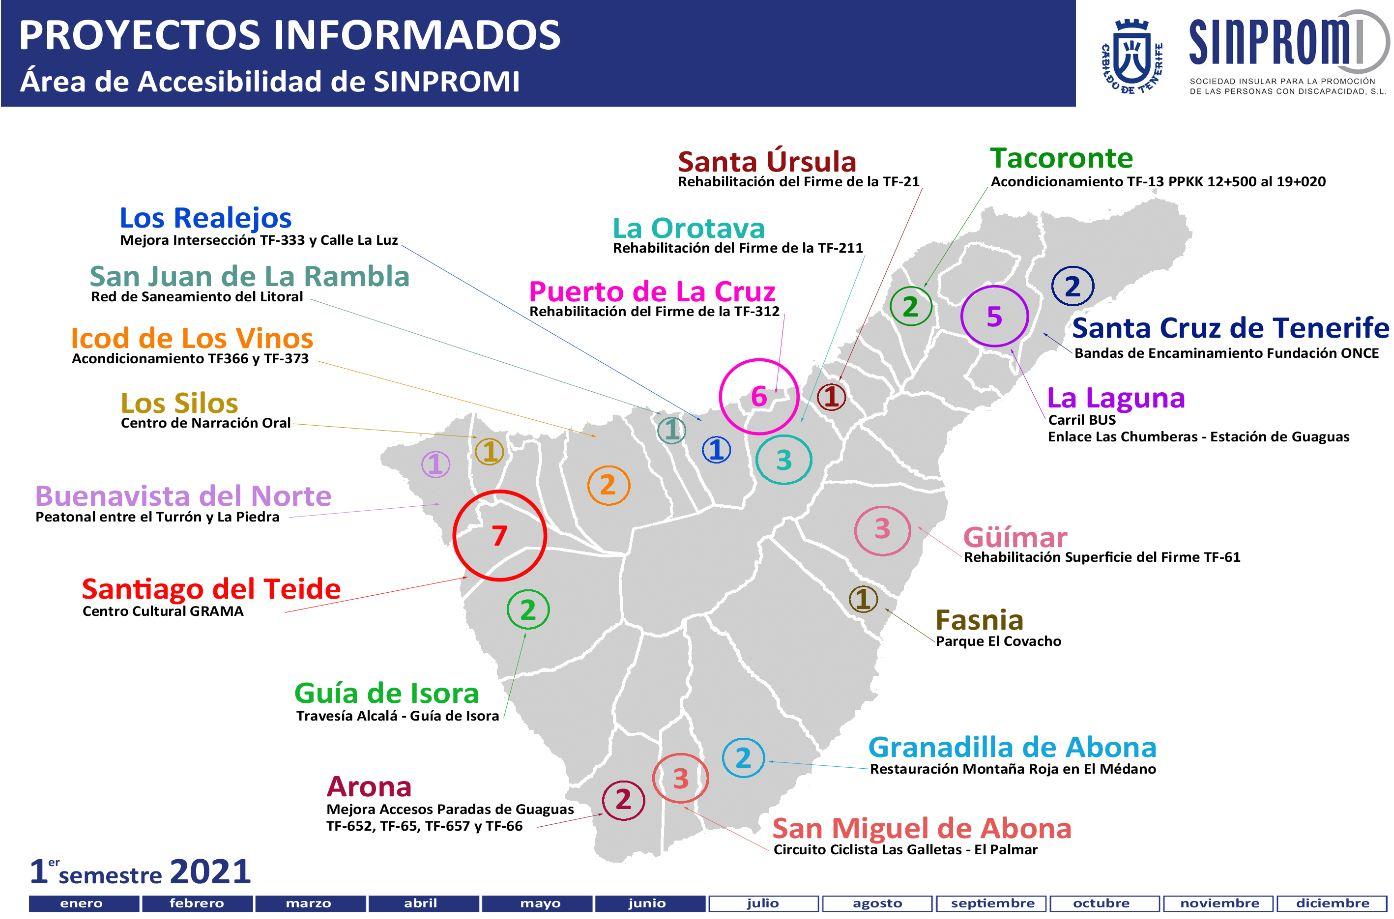 Mapa Tenerife - Proyectos informados Sinpromi